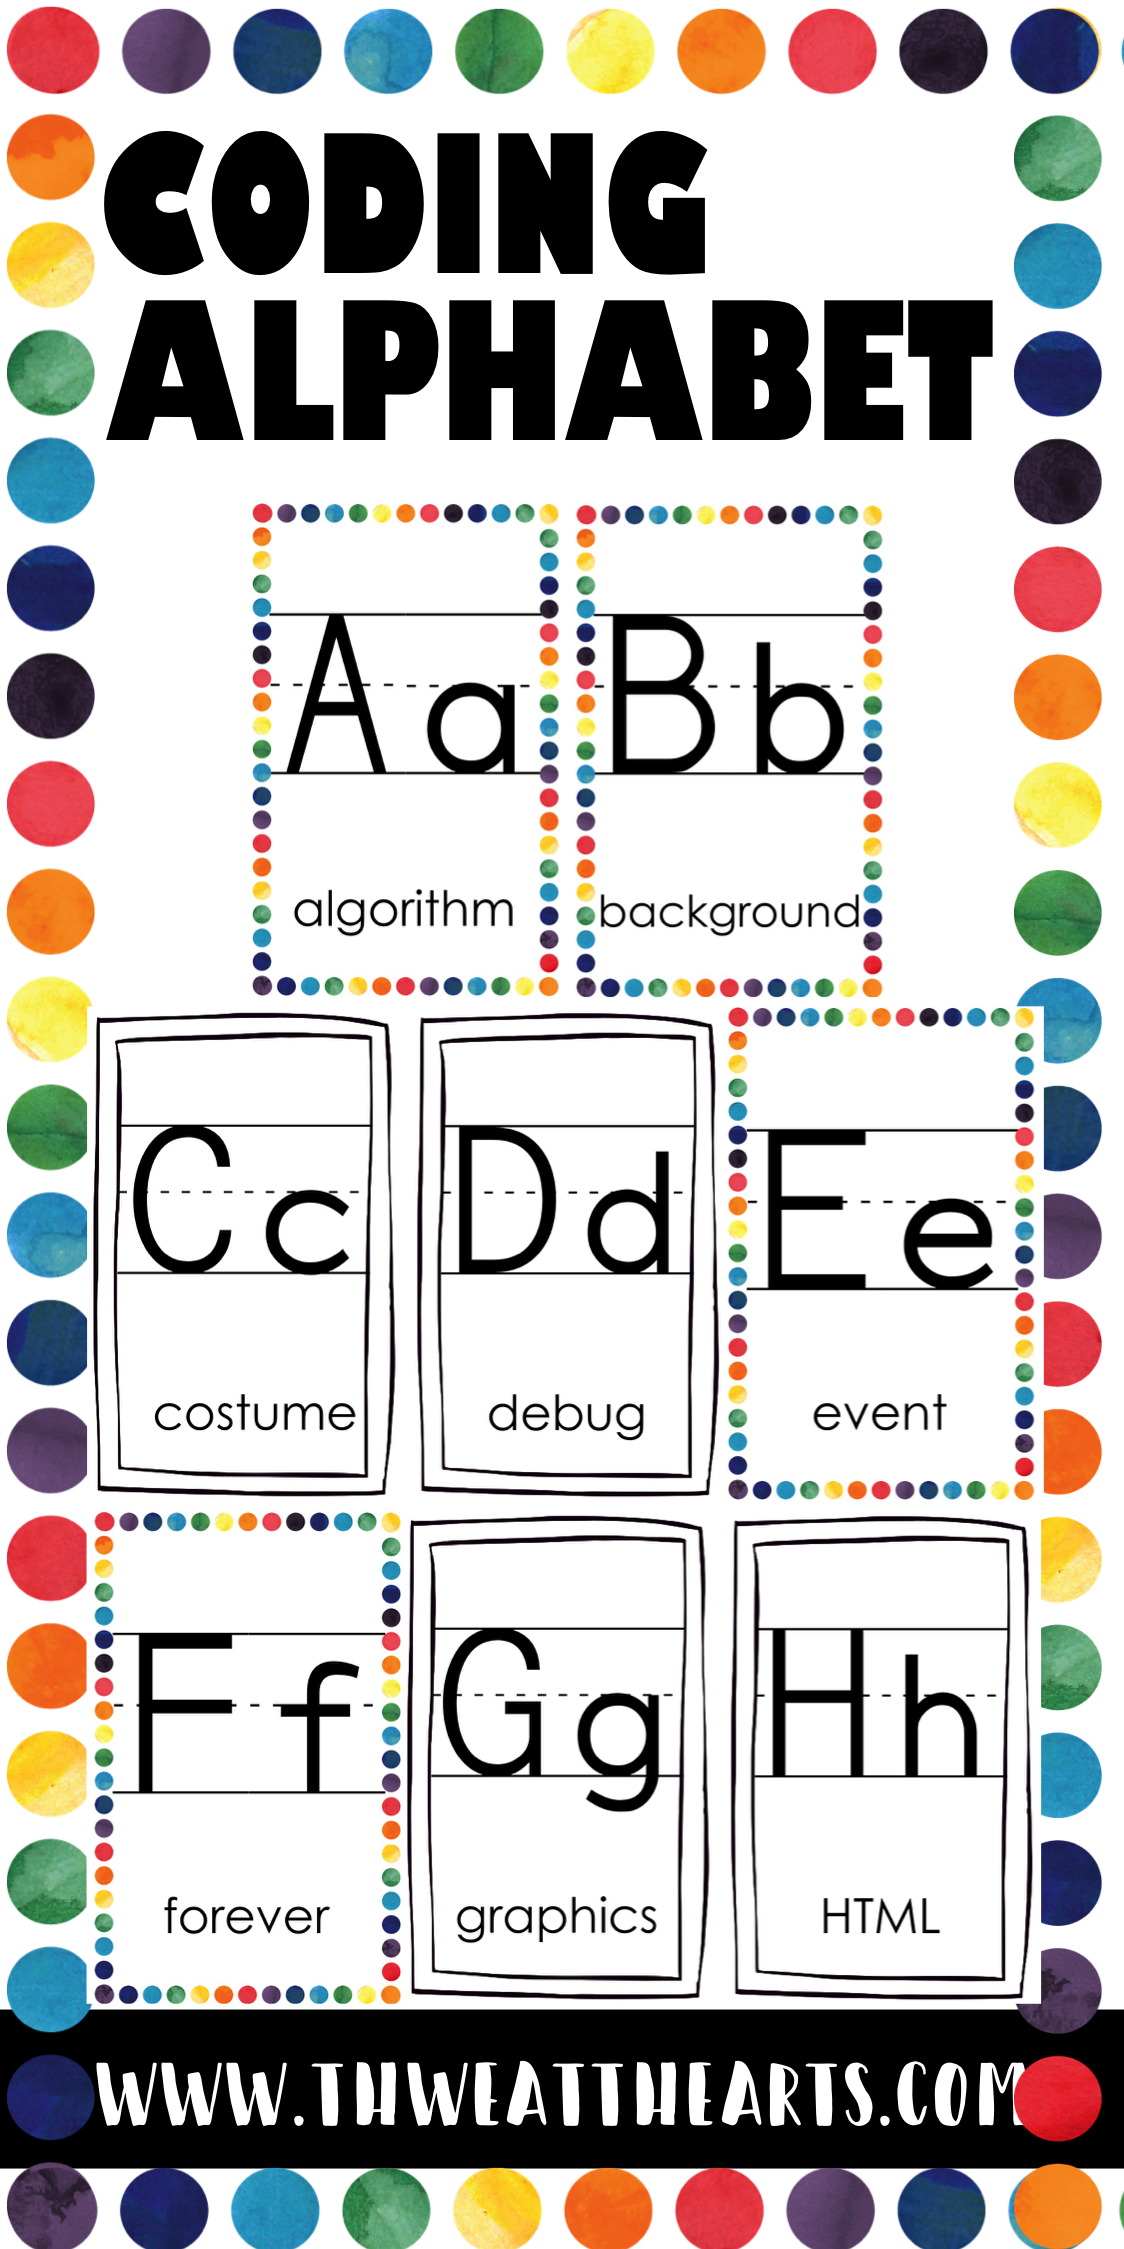 Coding Alphabet Posters